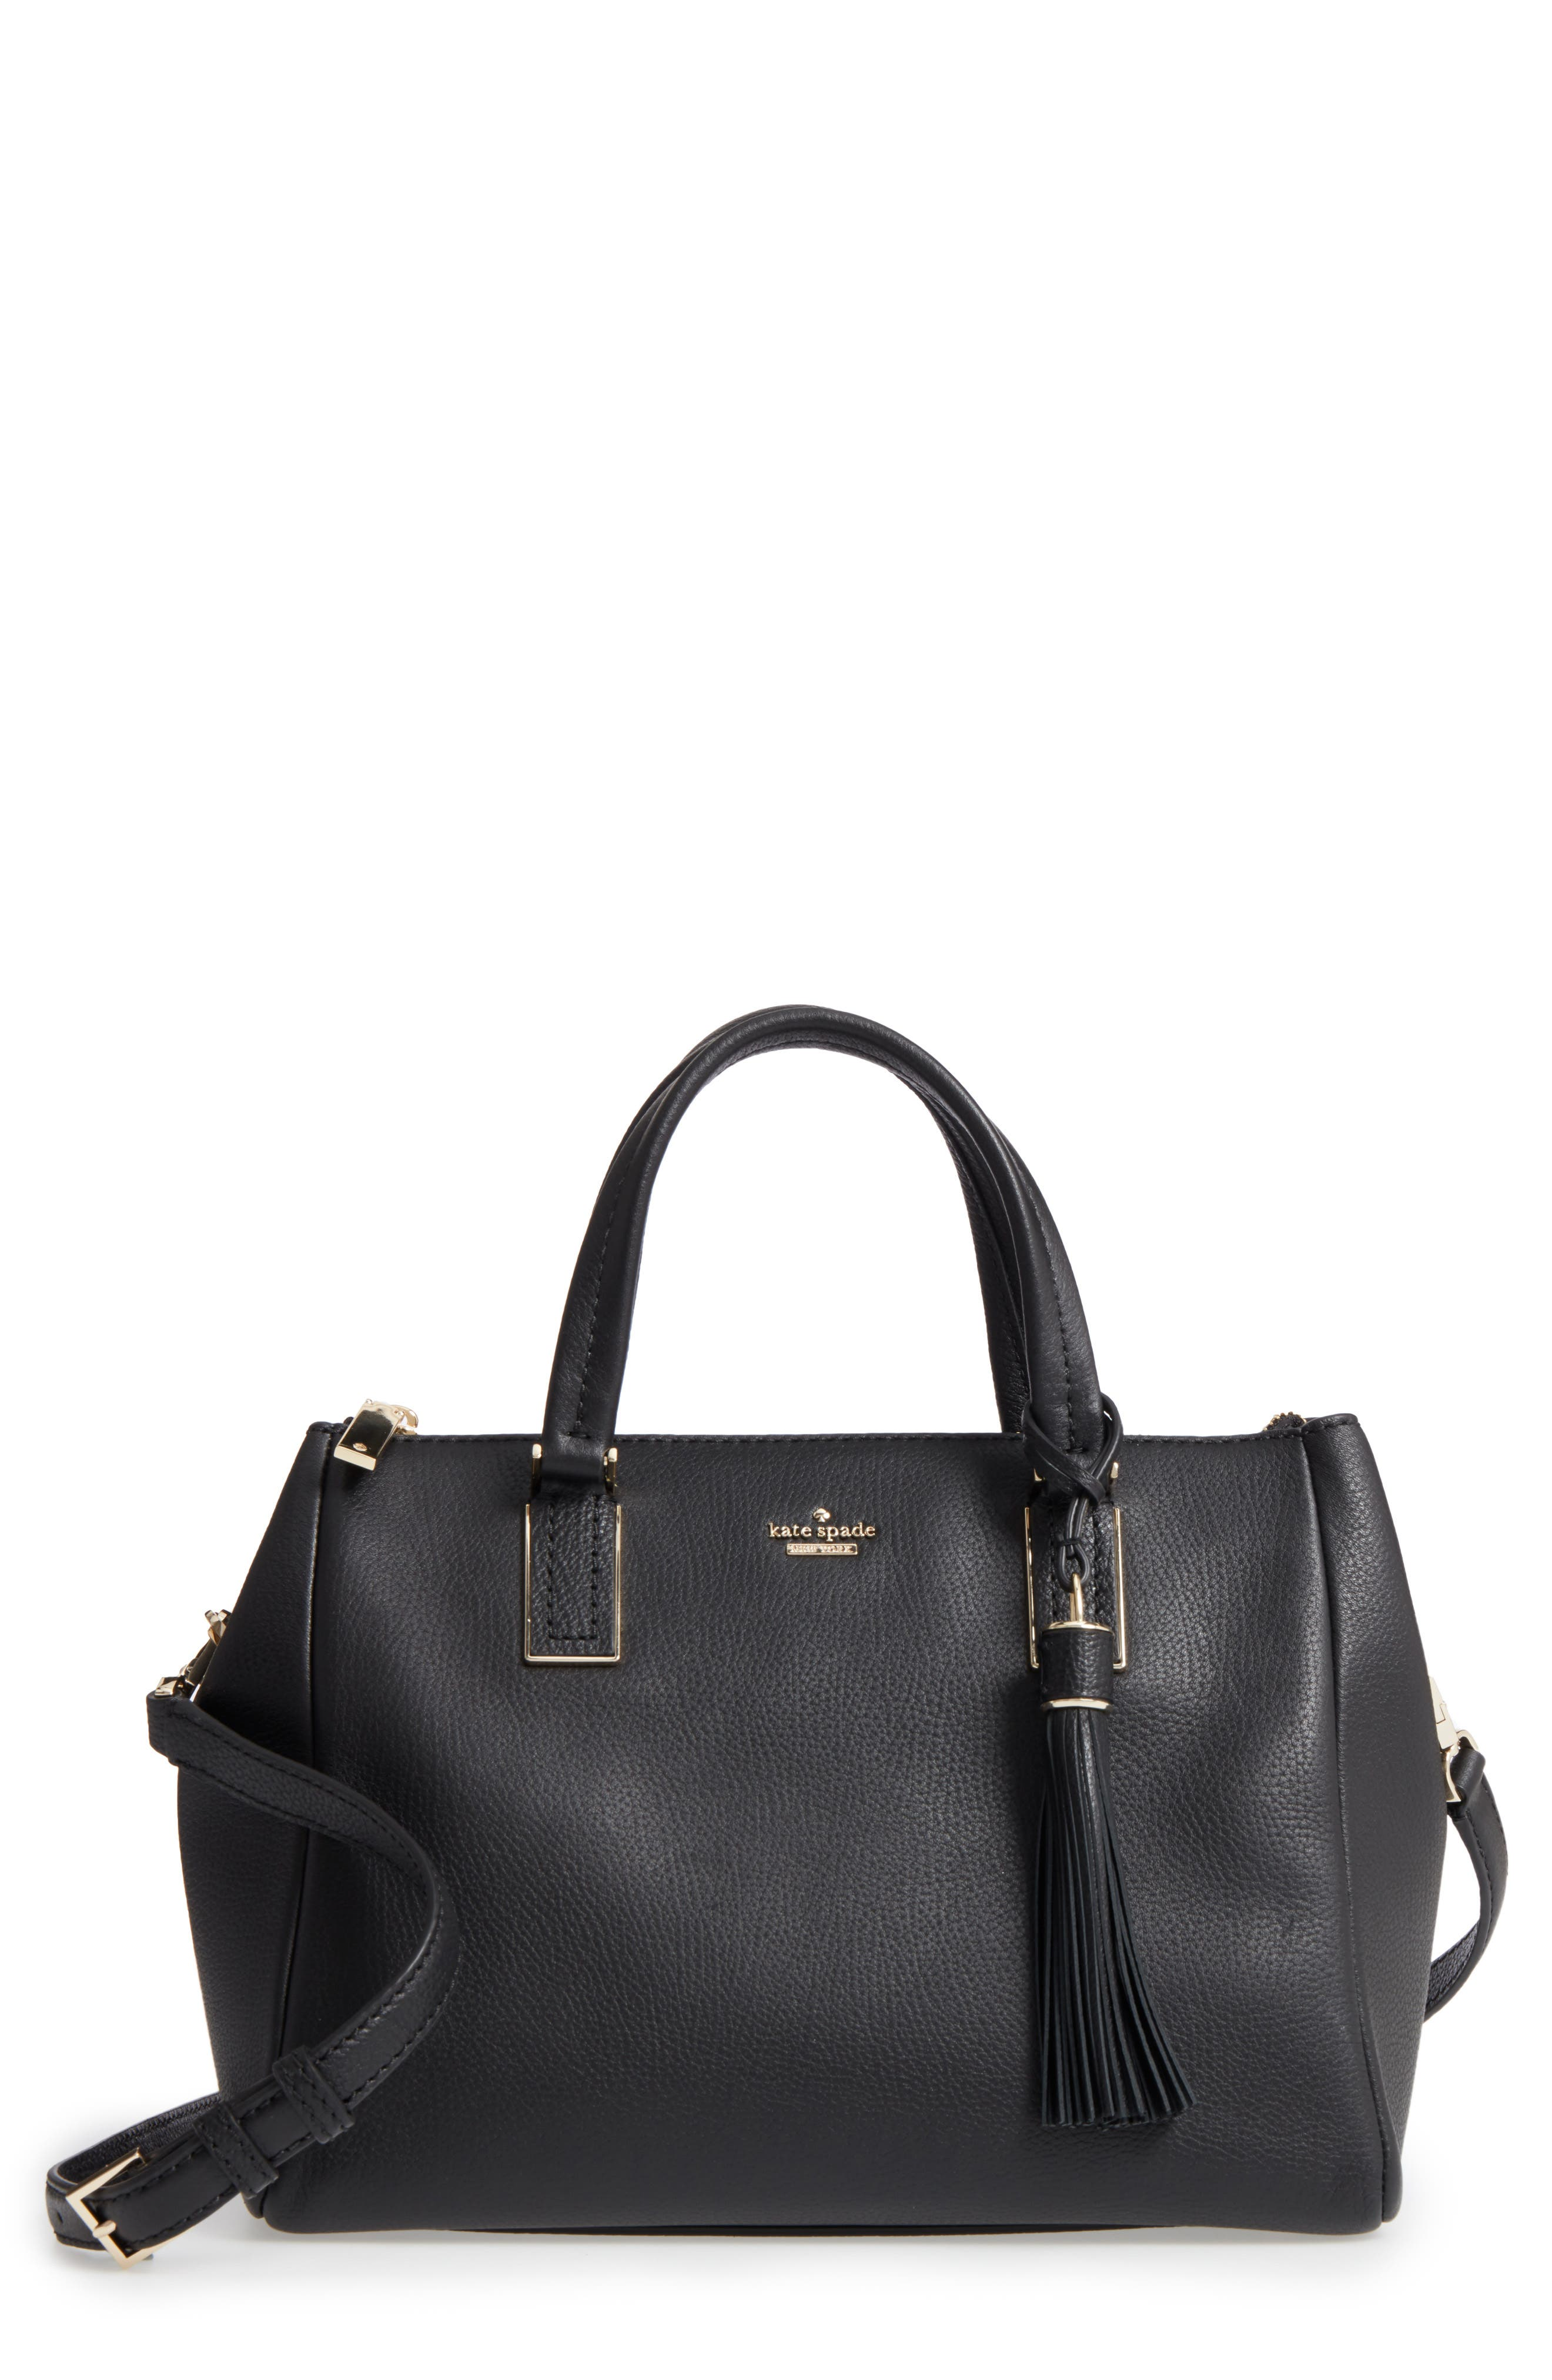 kate spade new york kingston drive - alena leather satchel